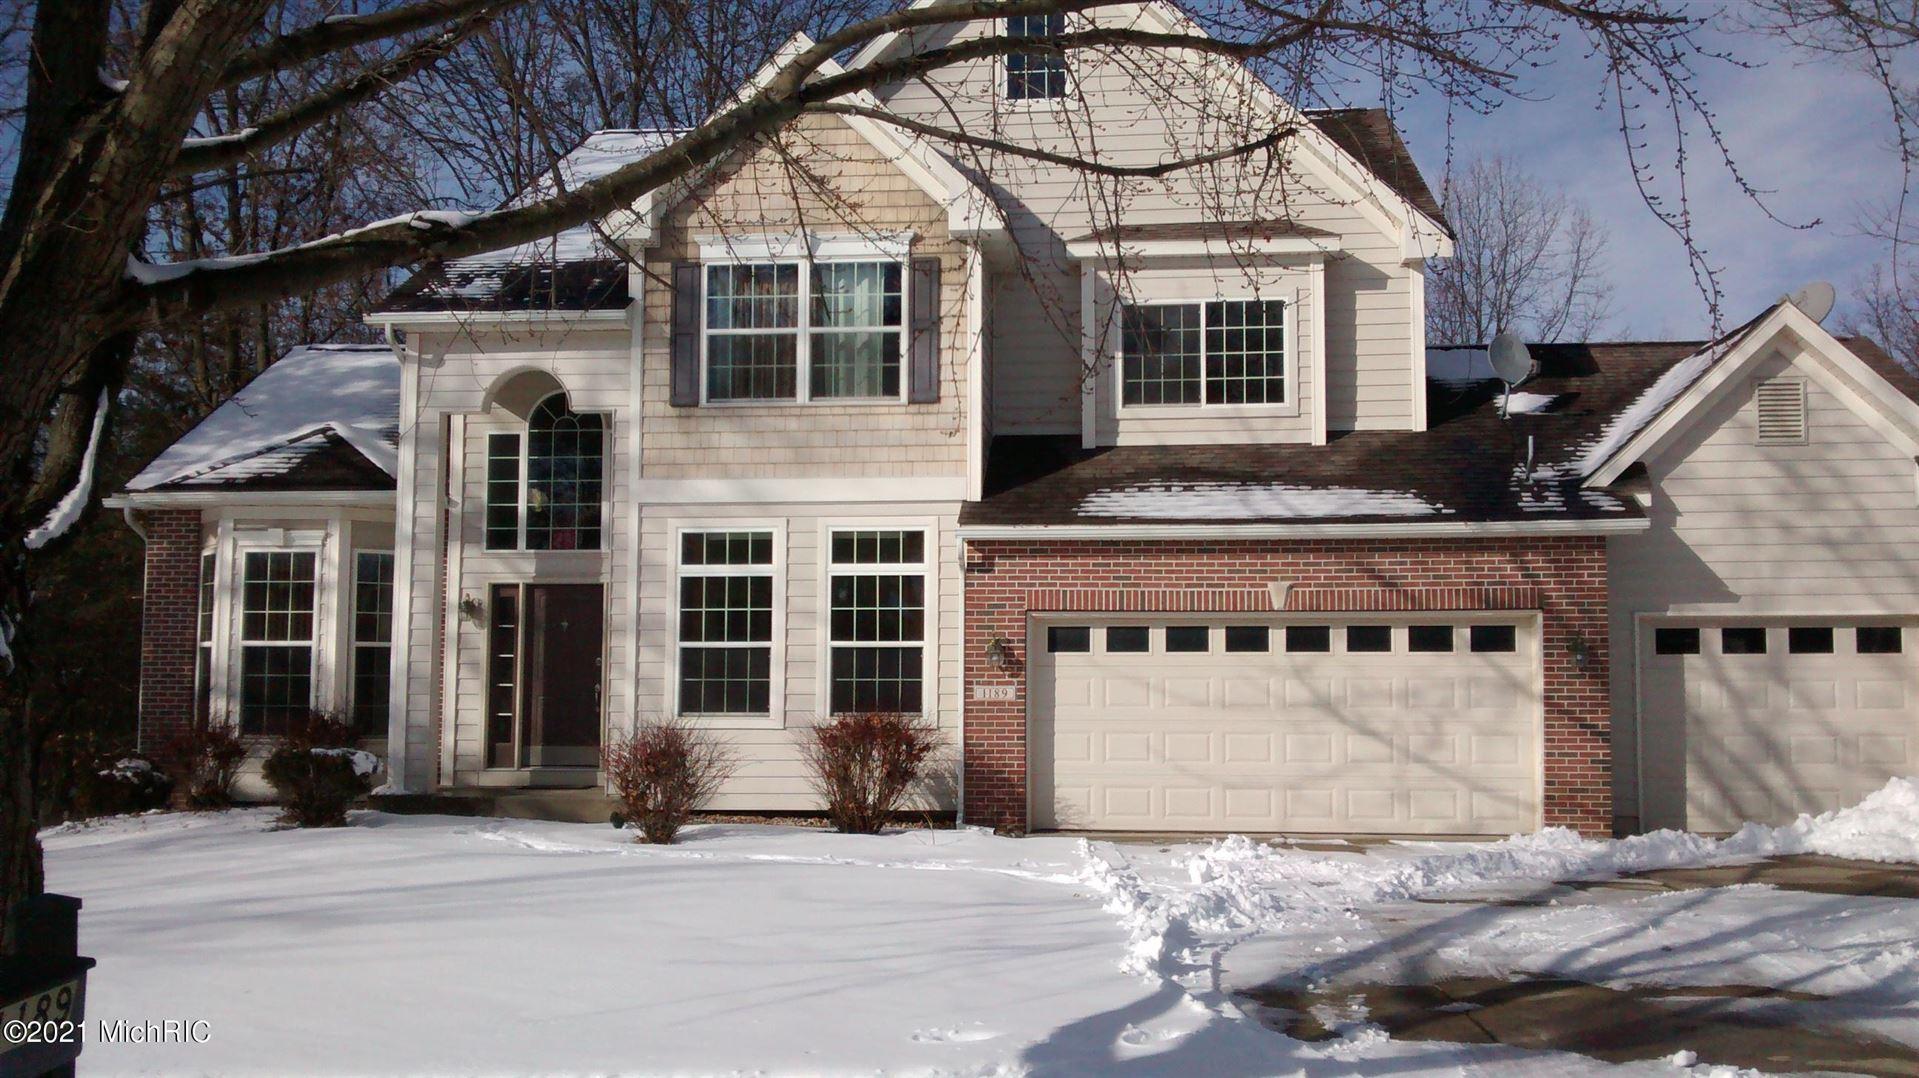 1189 Chaucer Avenue, Portage, MI 49002 - MLS#: 21003201